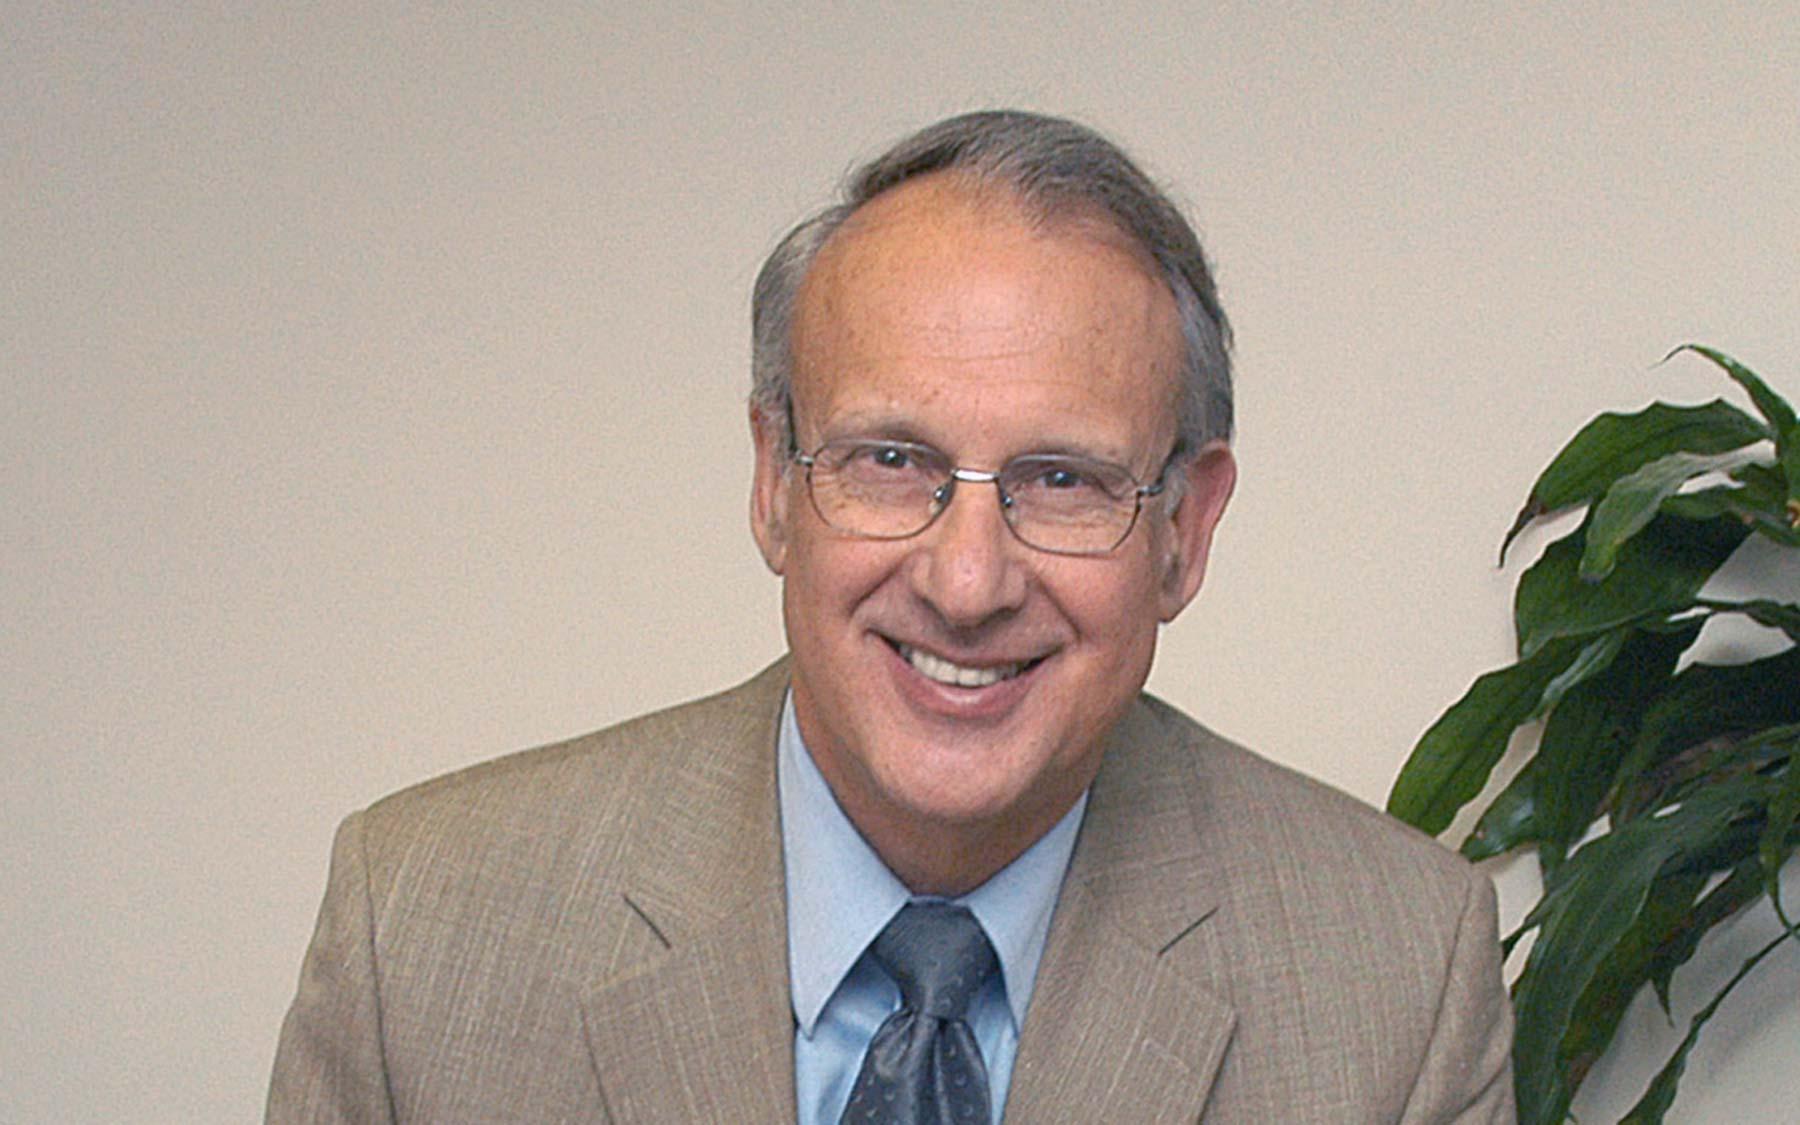 Video: CSHL Professor Fritz Henn discusses the challenge of